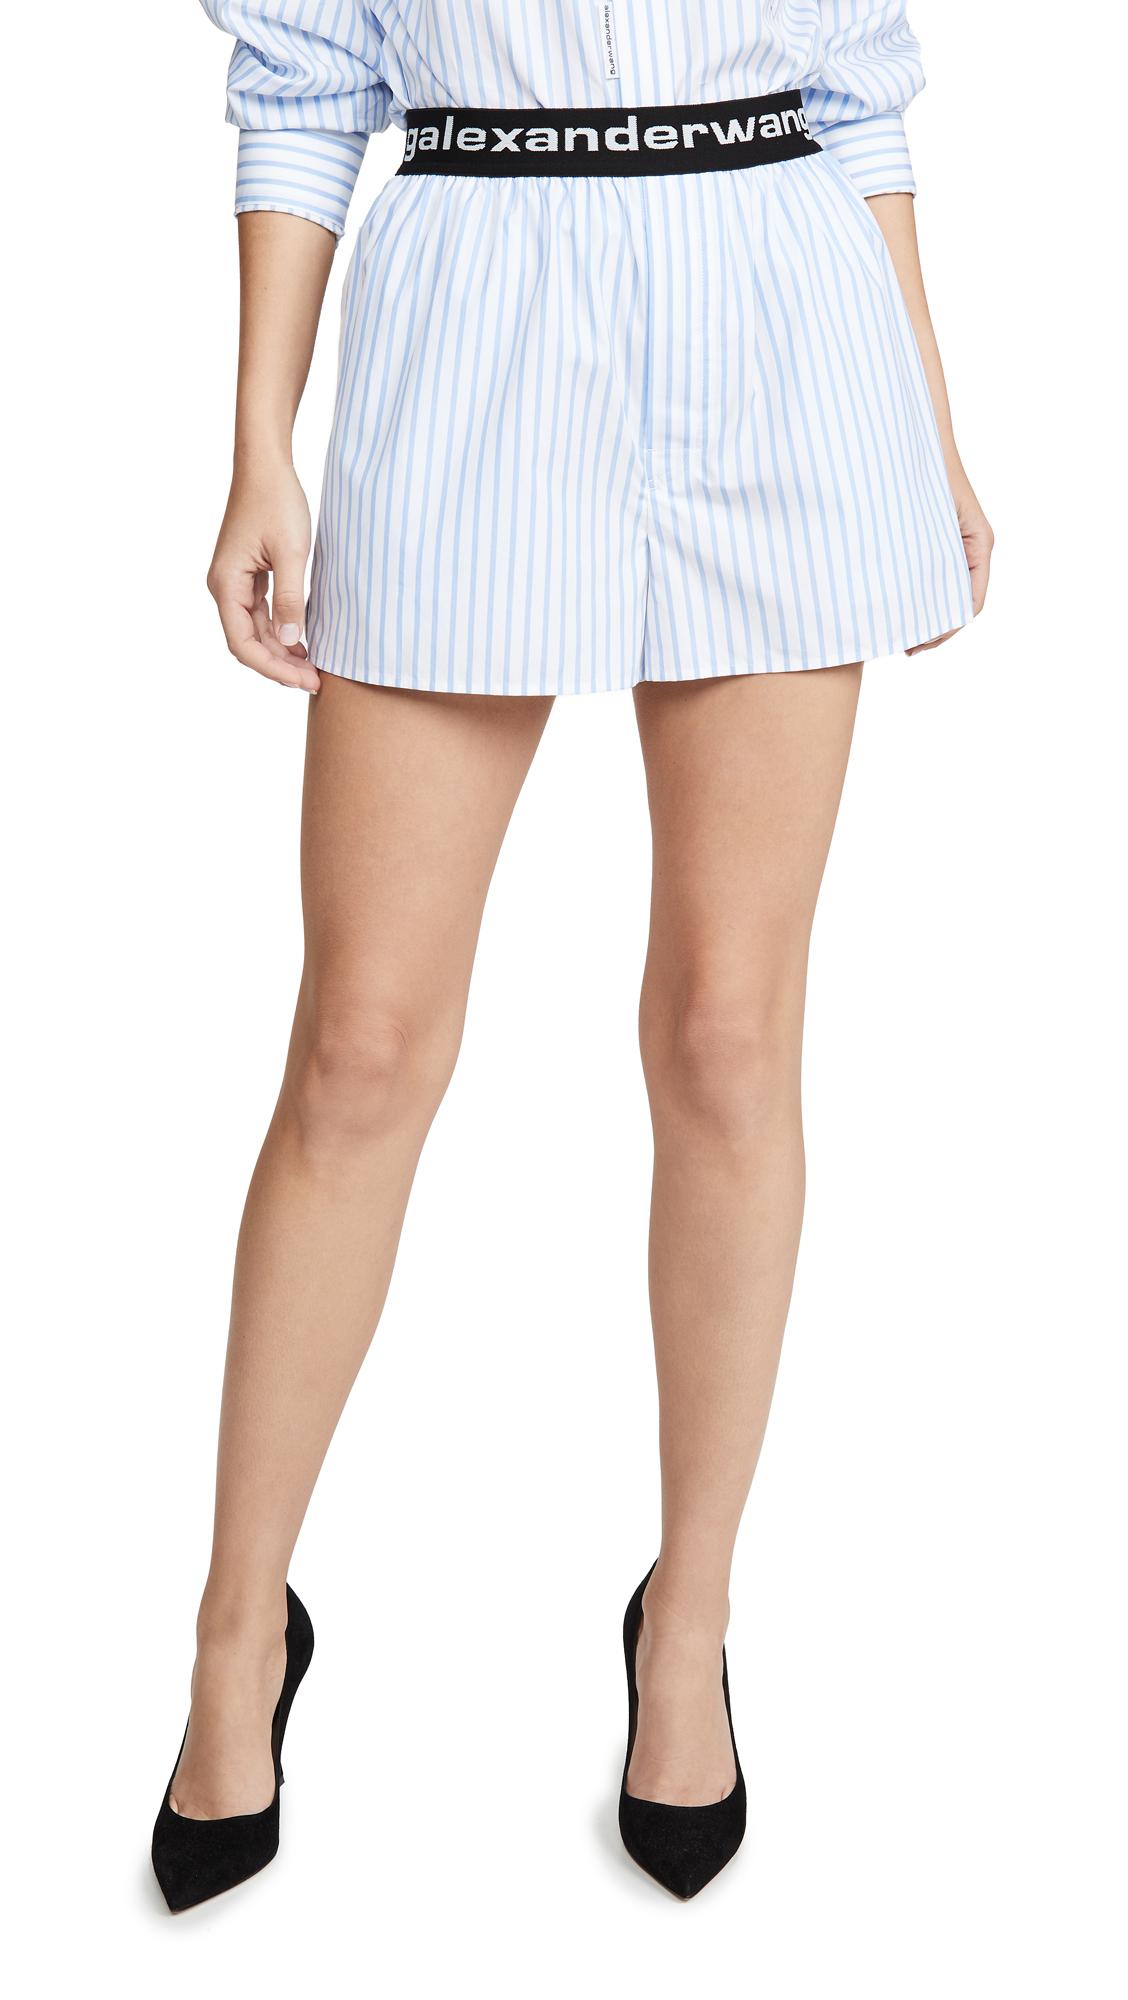 Alexander Wang Boxer Shorts with Logo Elastic - Blue/White Stripe